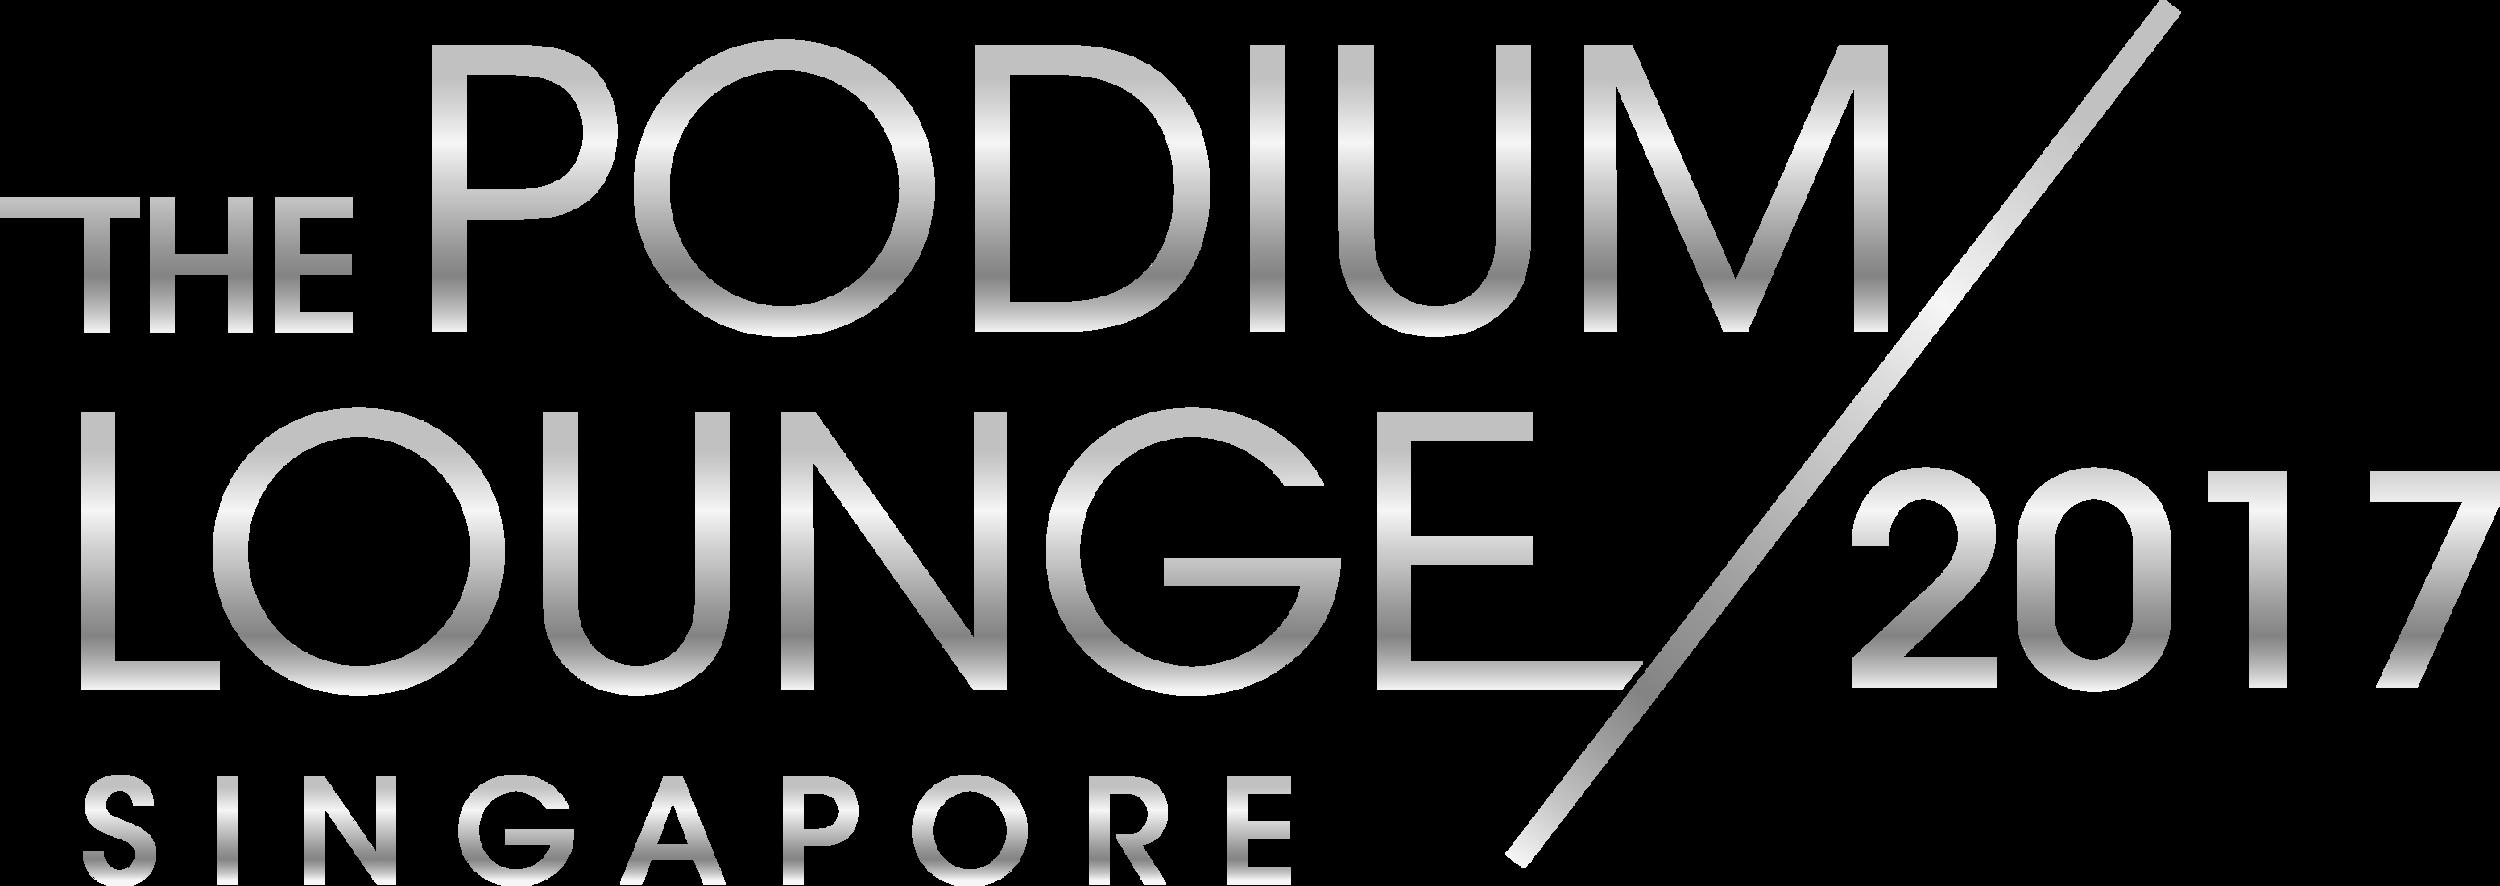 The Podium Lounge Singapore 2017 Logo.png